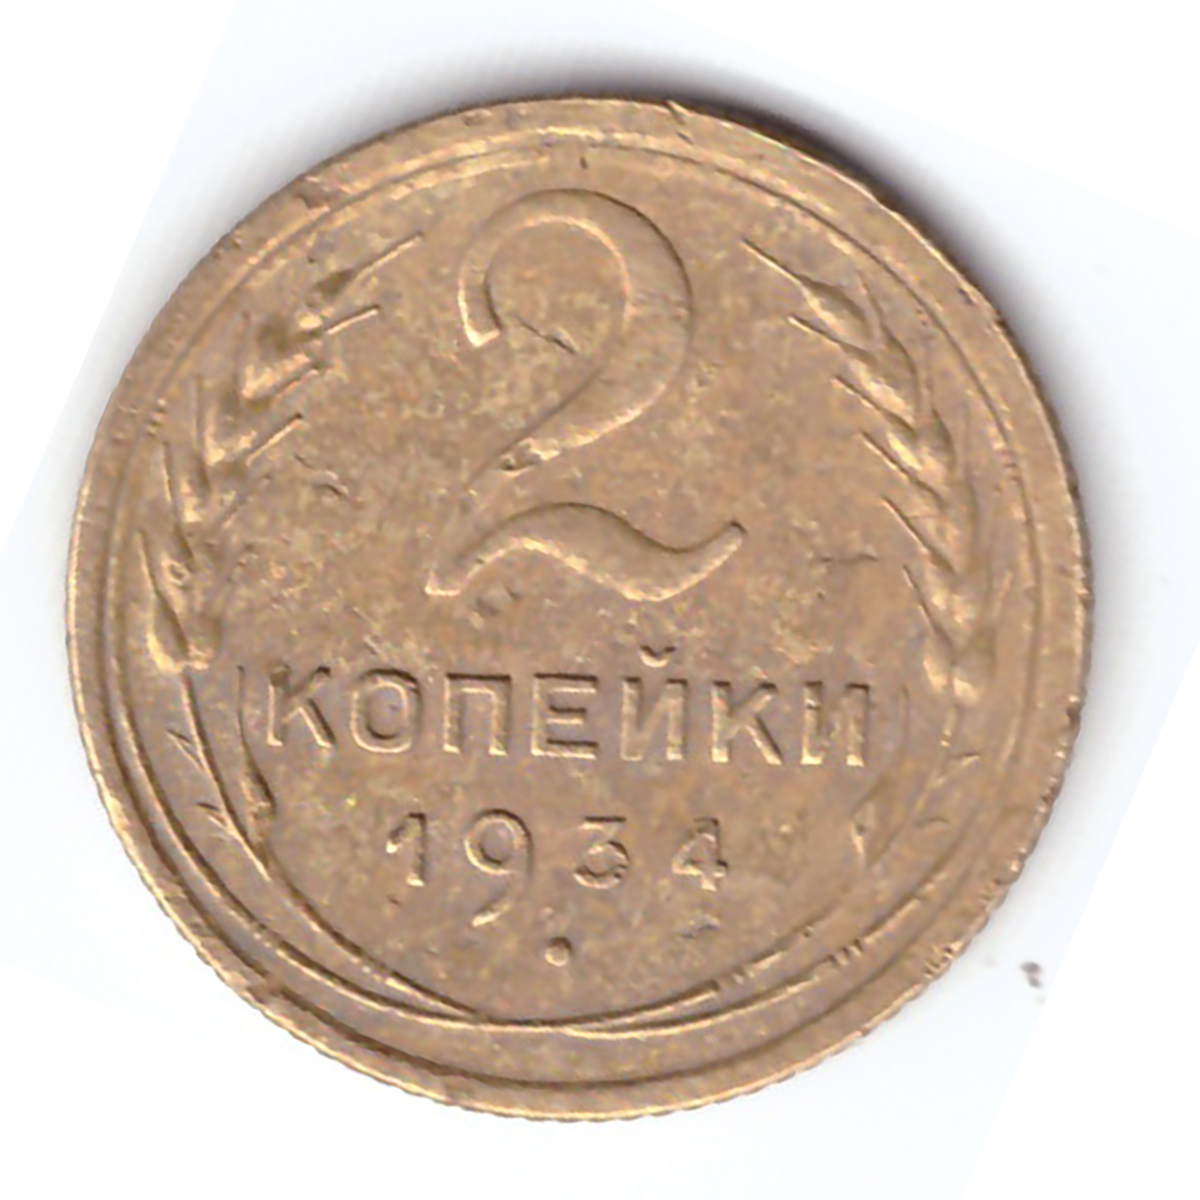 2 копейки 1934 года. F №2